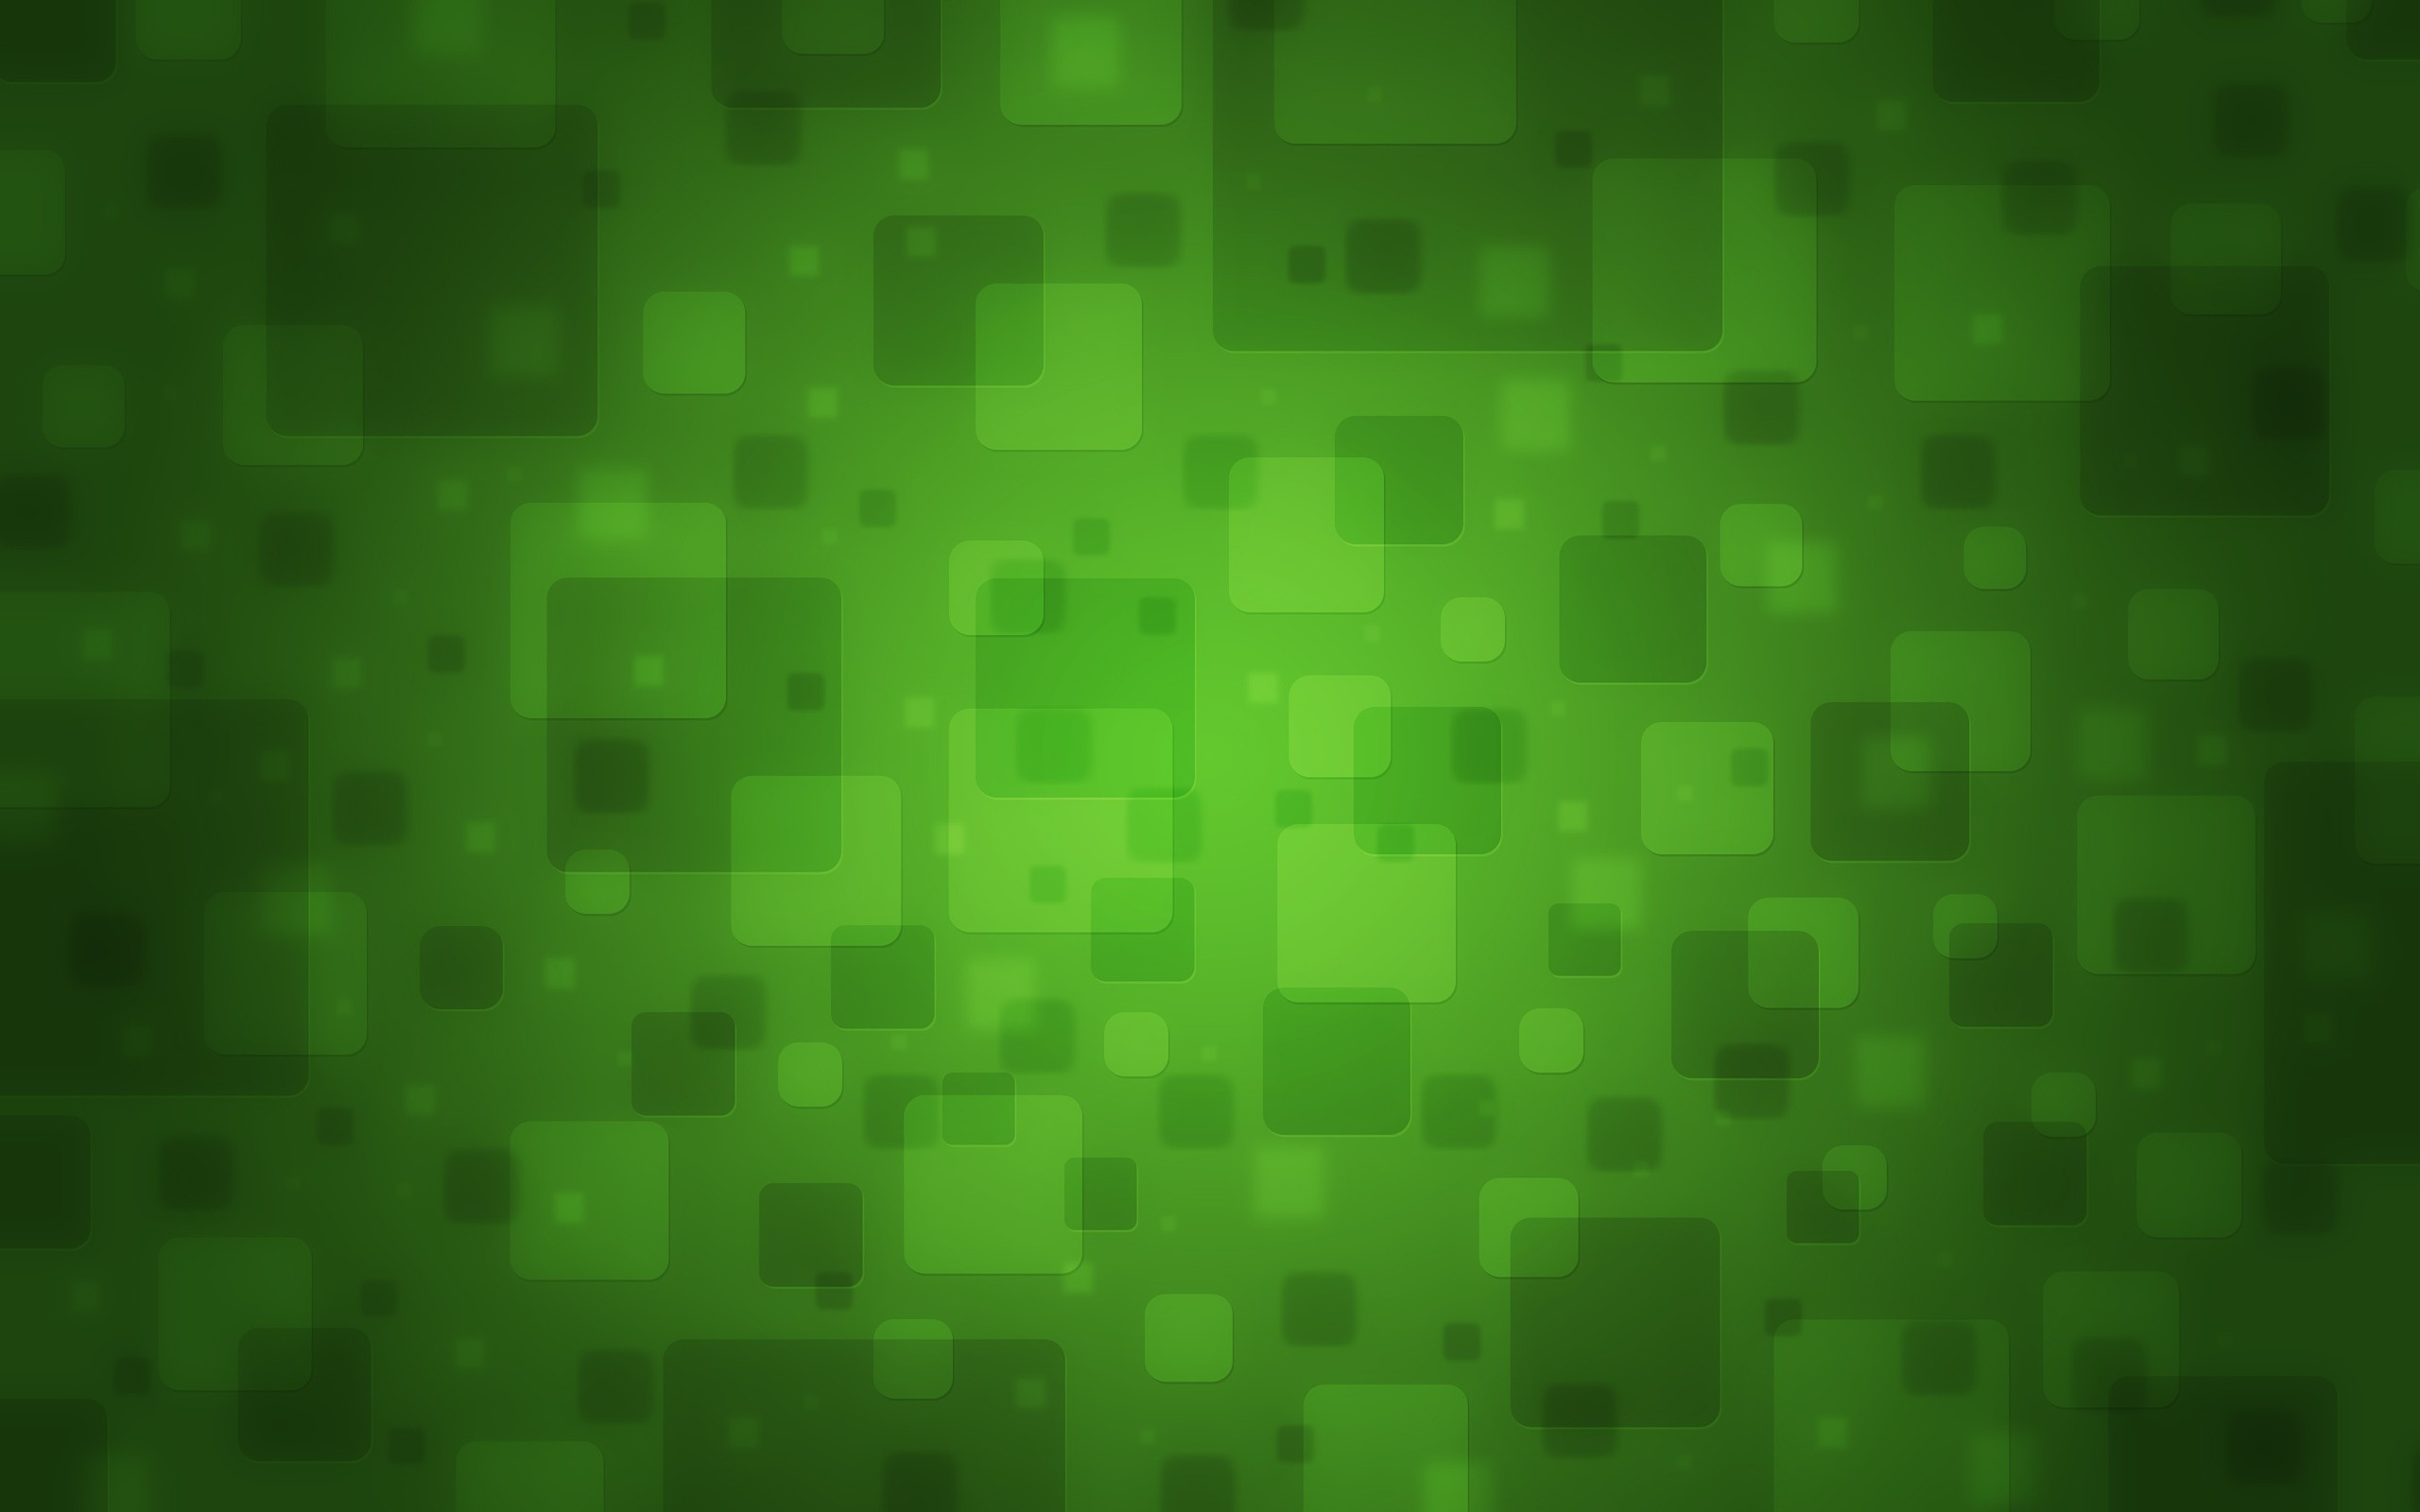 General 2560x1600 minimalism digital art green background square